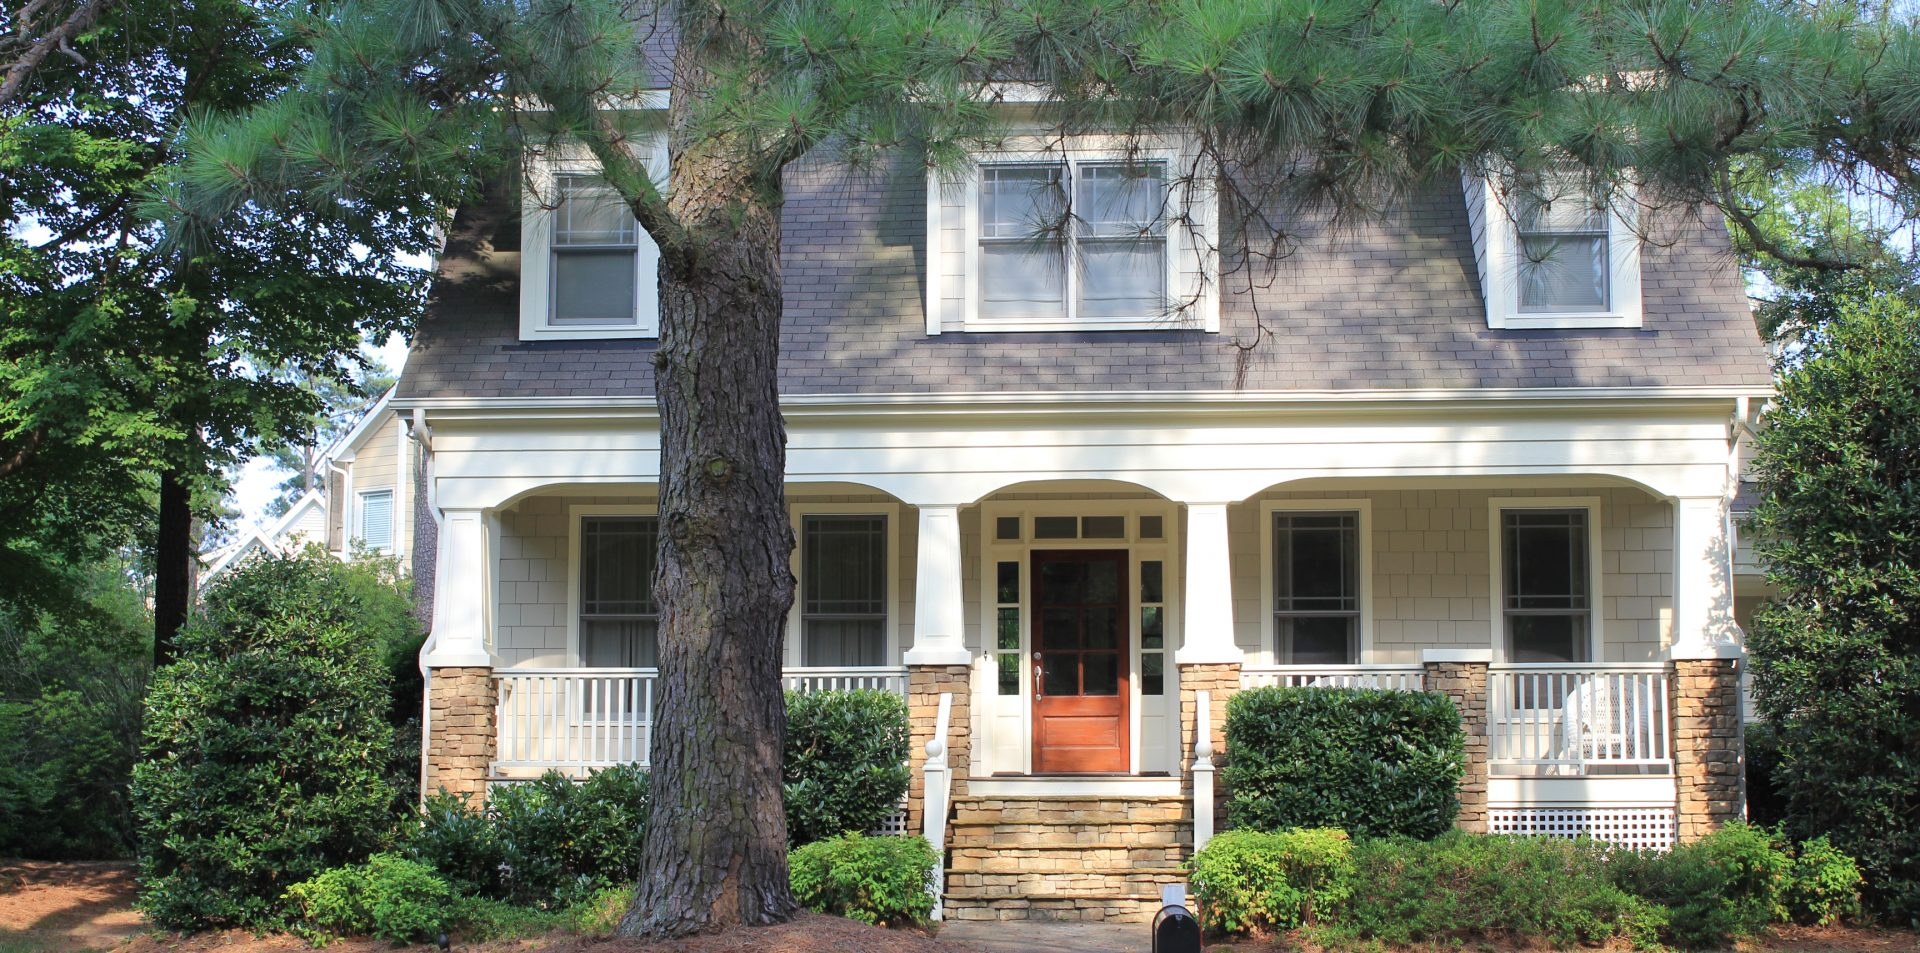 Davis Village Homes Cary Nc